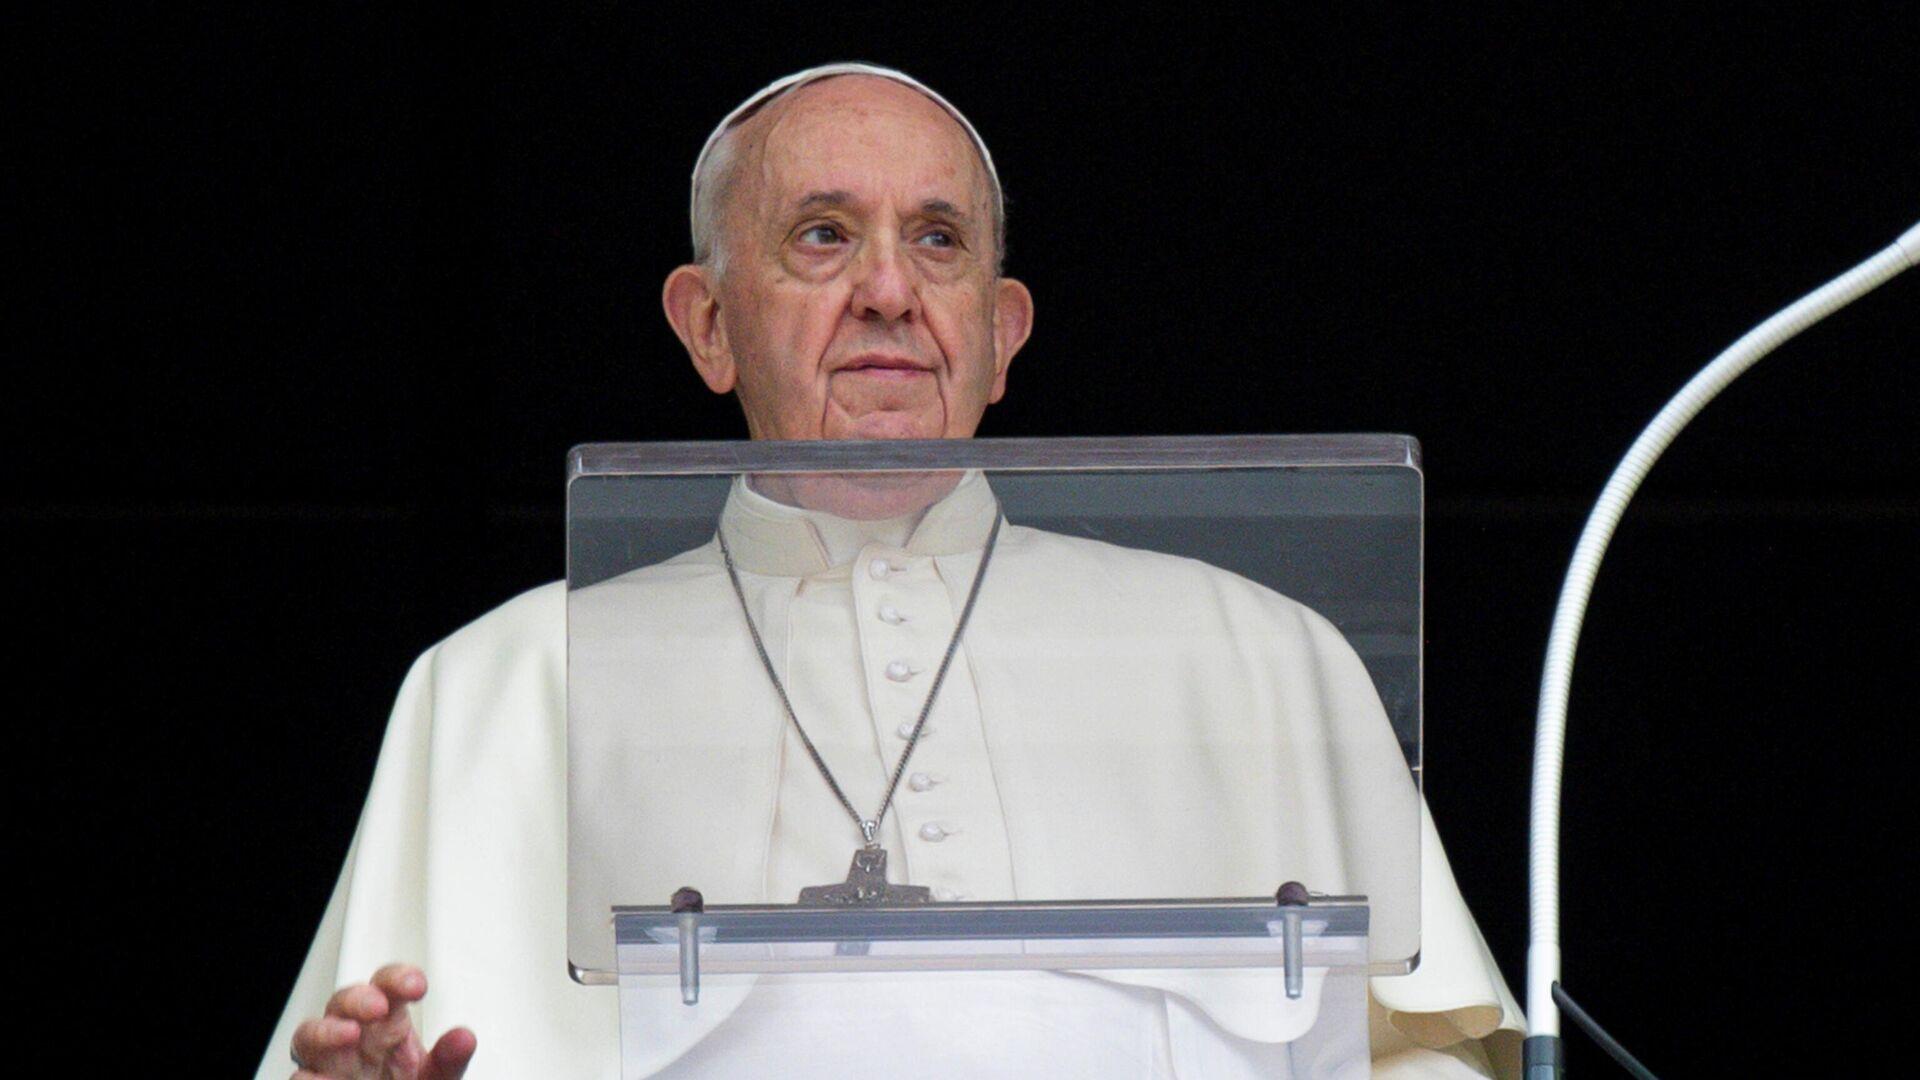 El papa Francisco - Sputnik Mundo, 1920, 13.10.2021